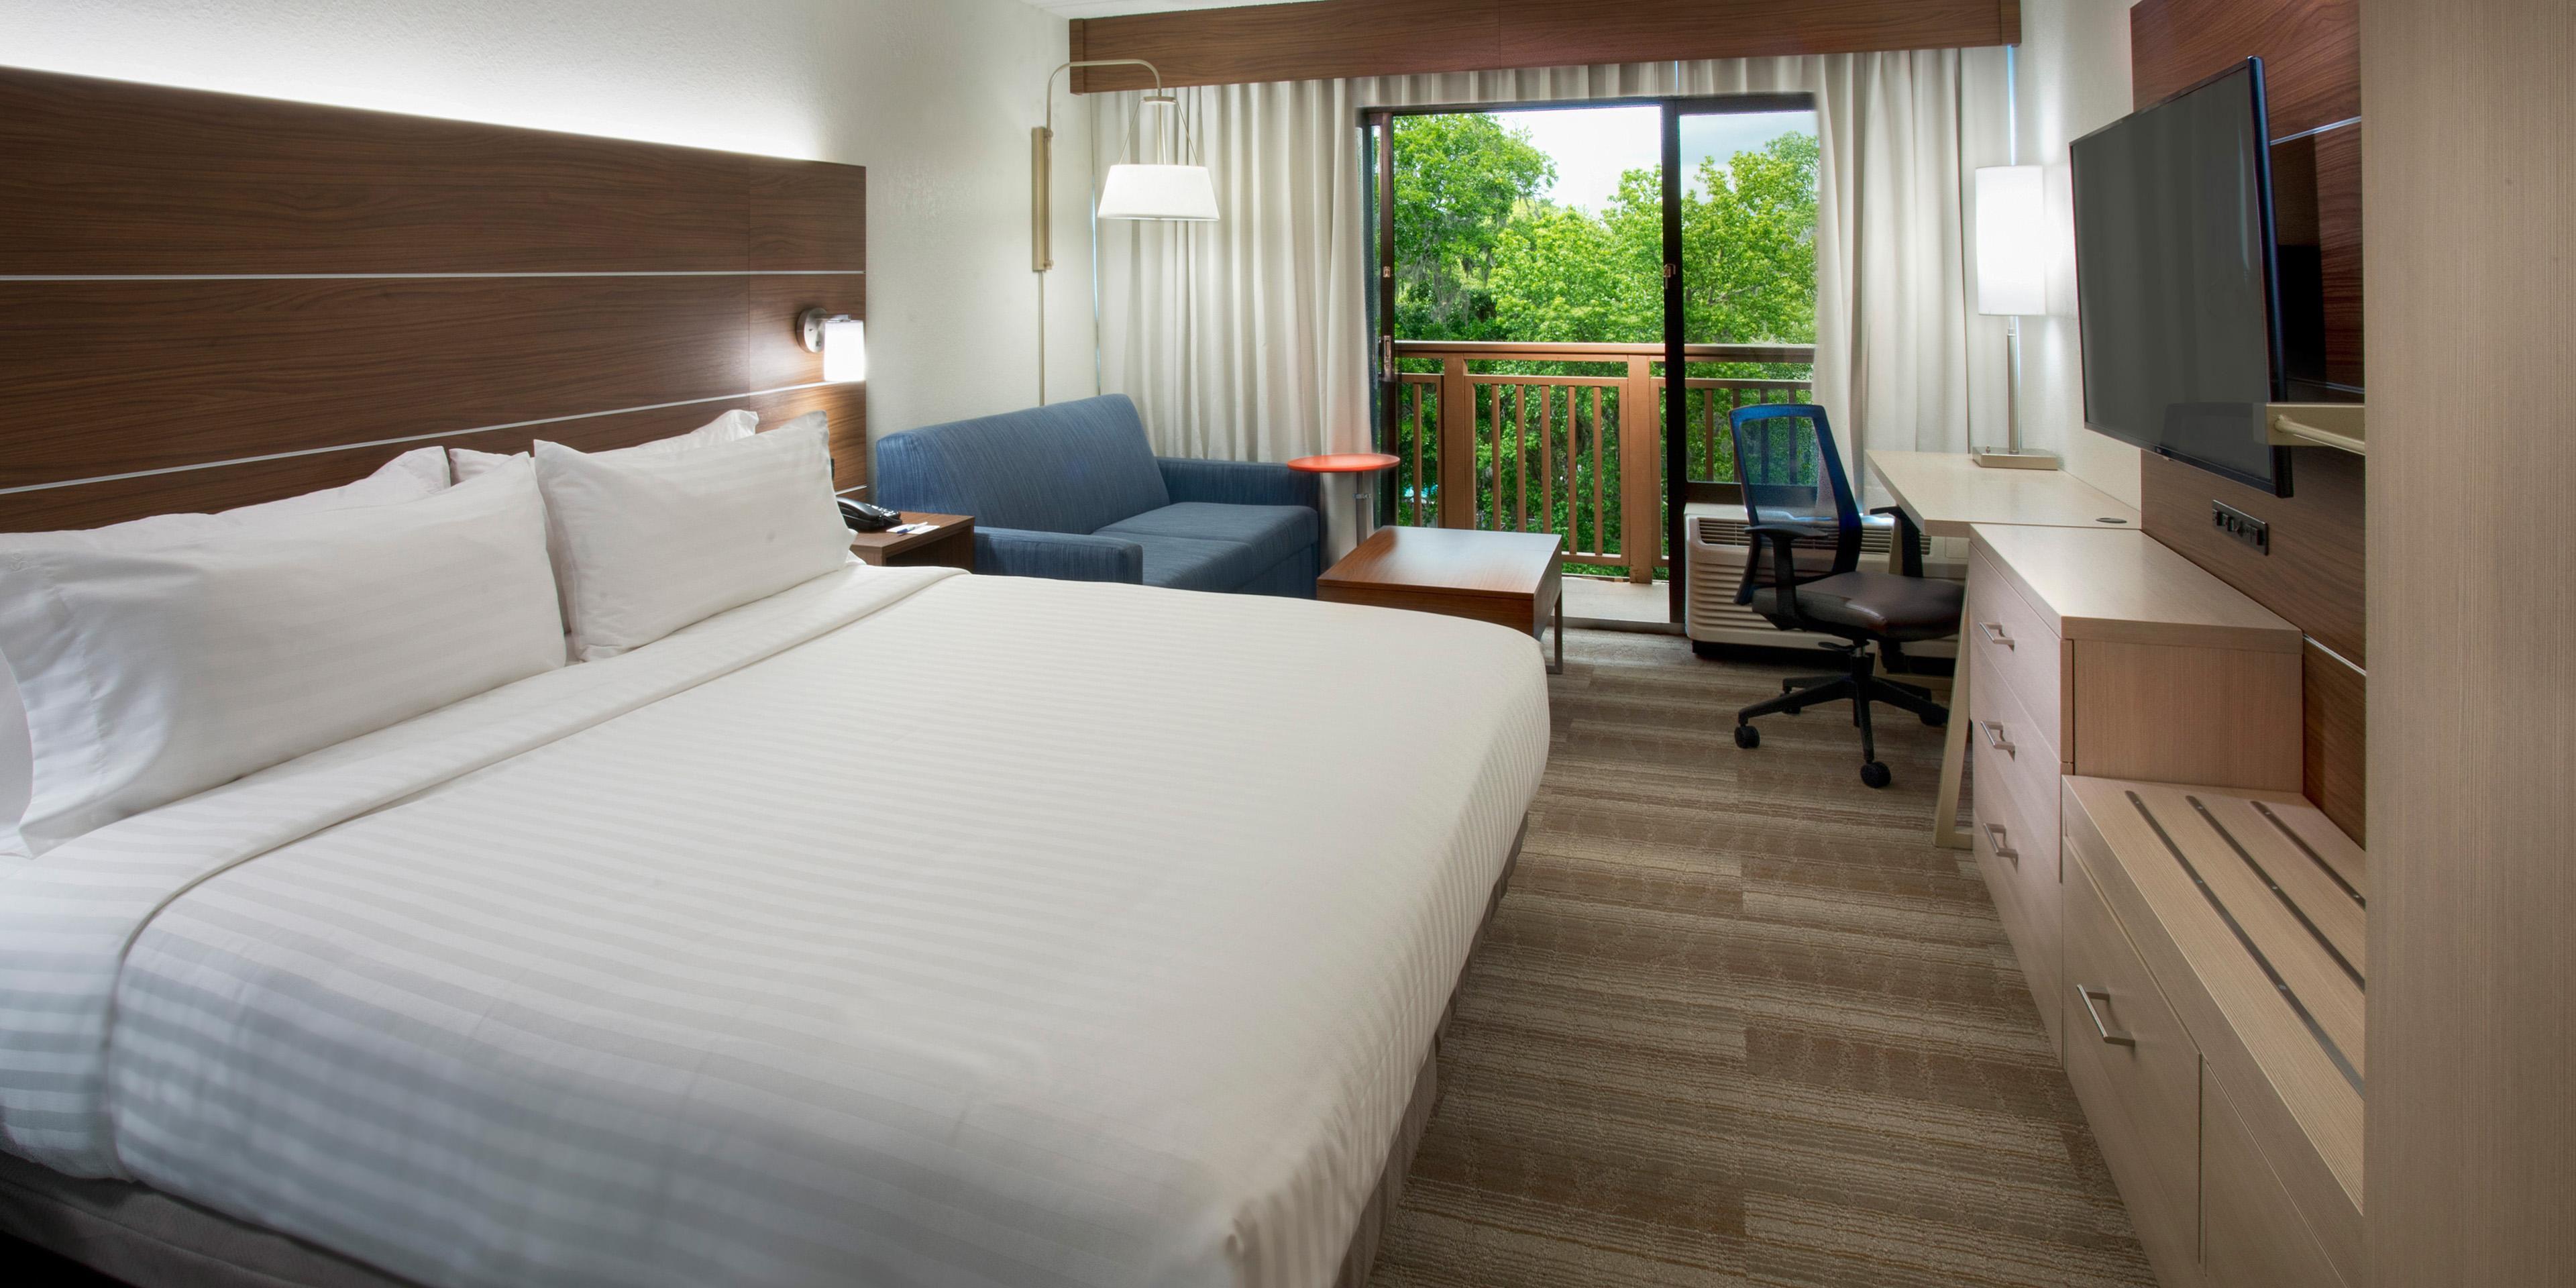 Holiday Inn Express Hilton Head 4530263371 2x1